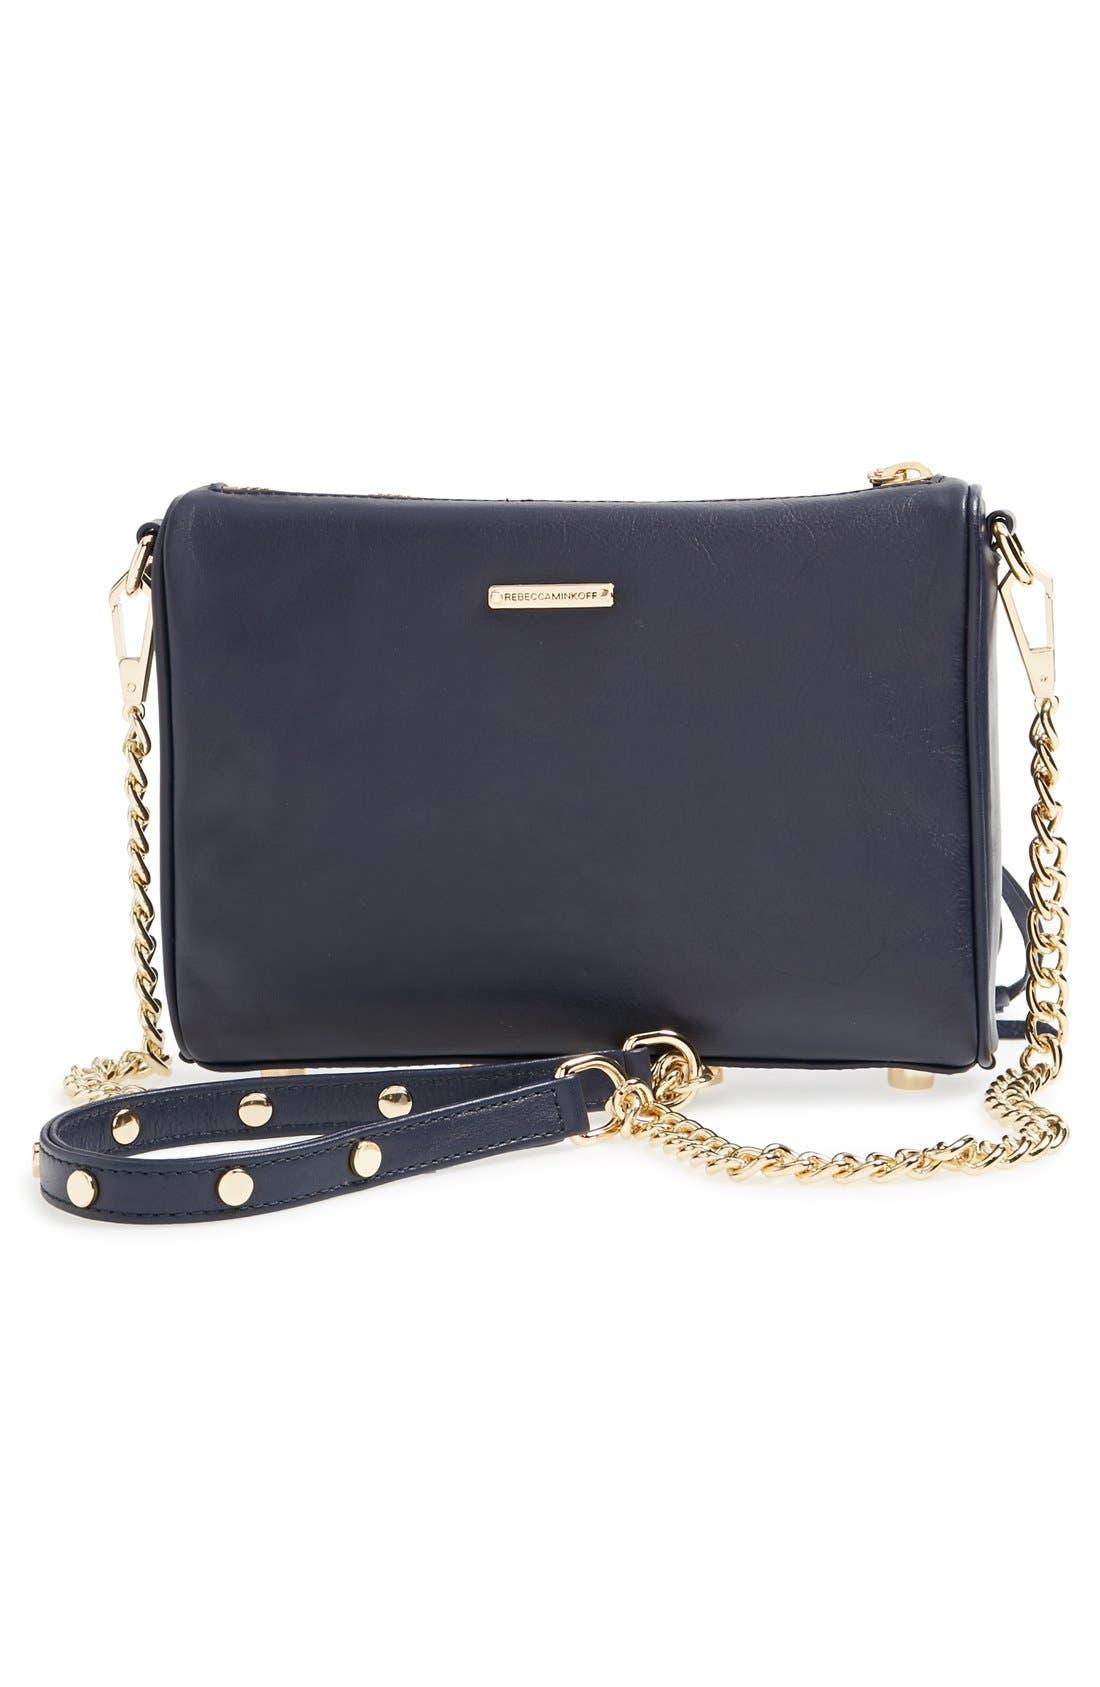 Alternate Image 3  - Rebecca Minkoff 'Mini 5-Zip' Convertible Crossbody Bag